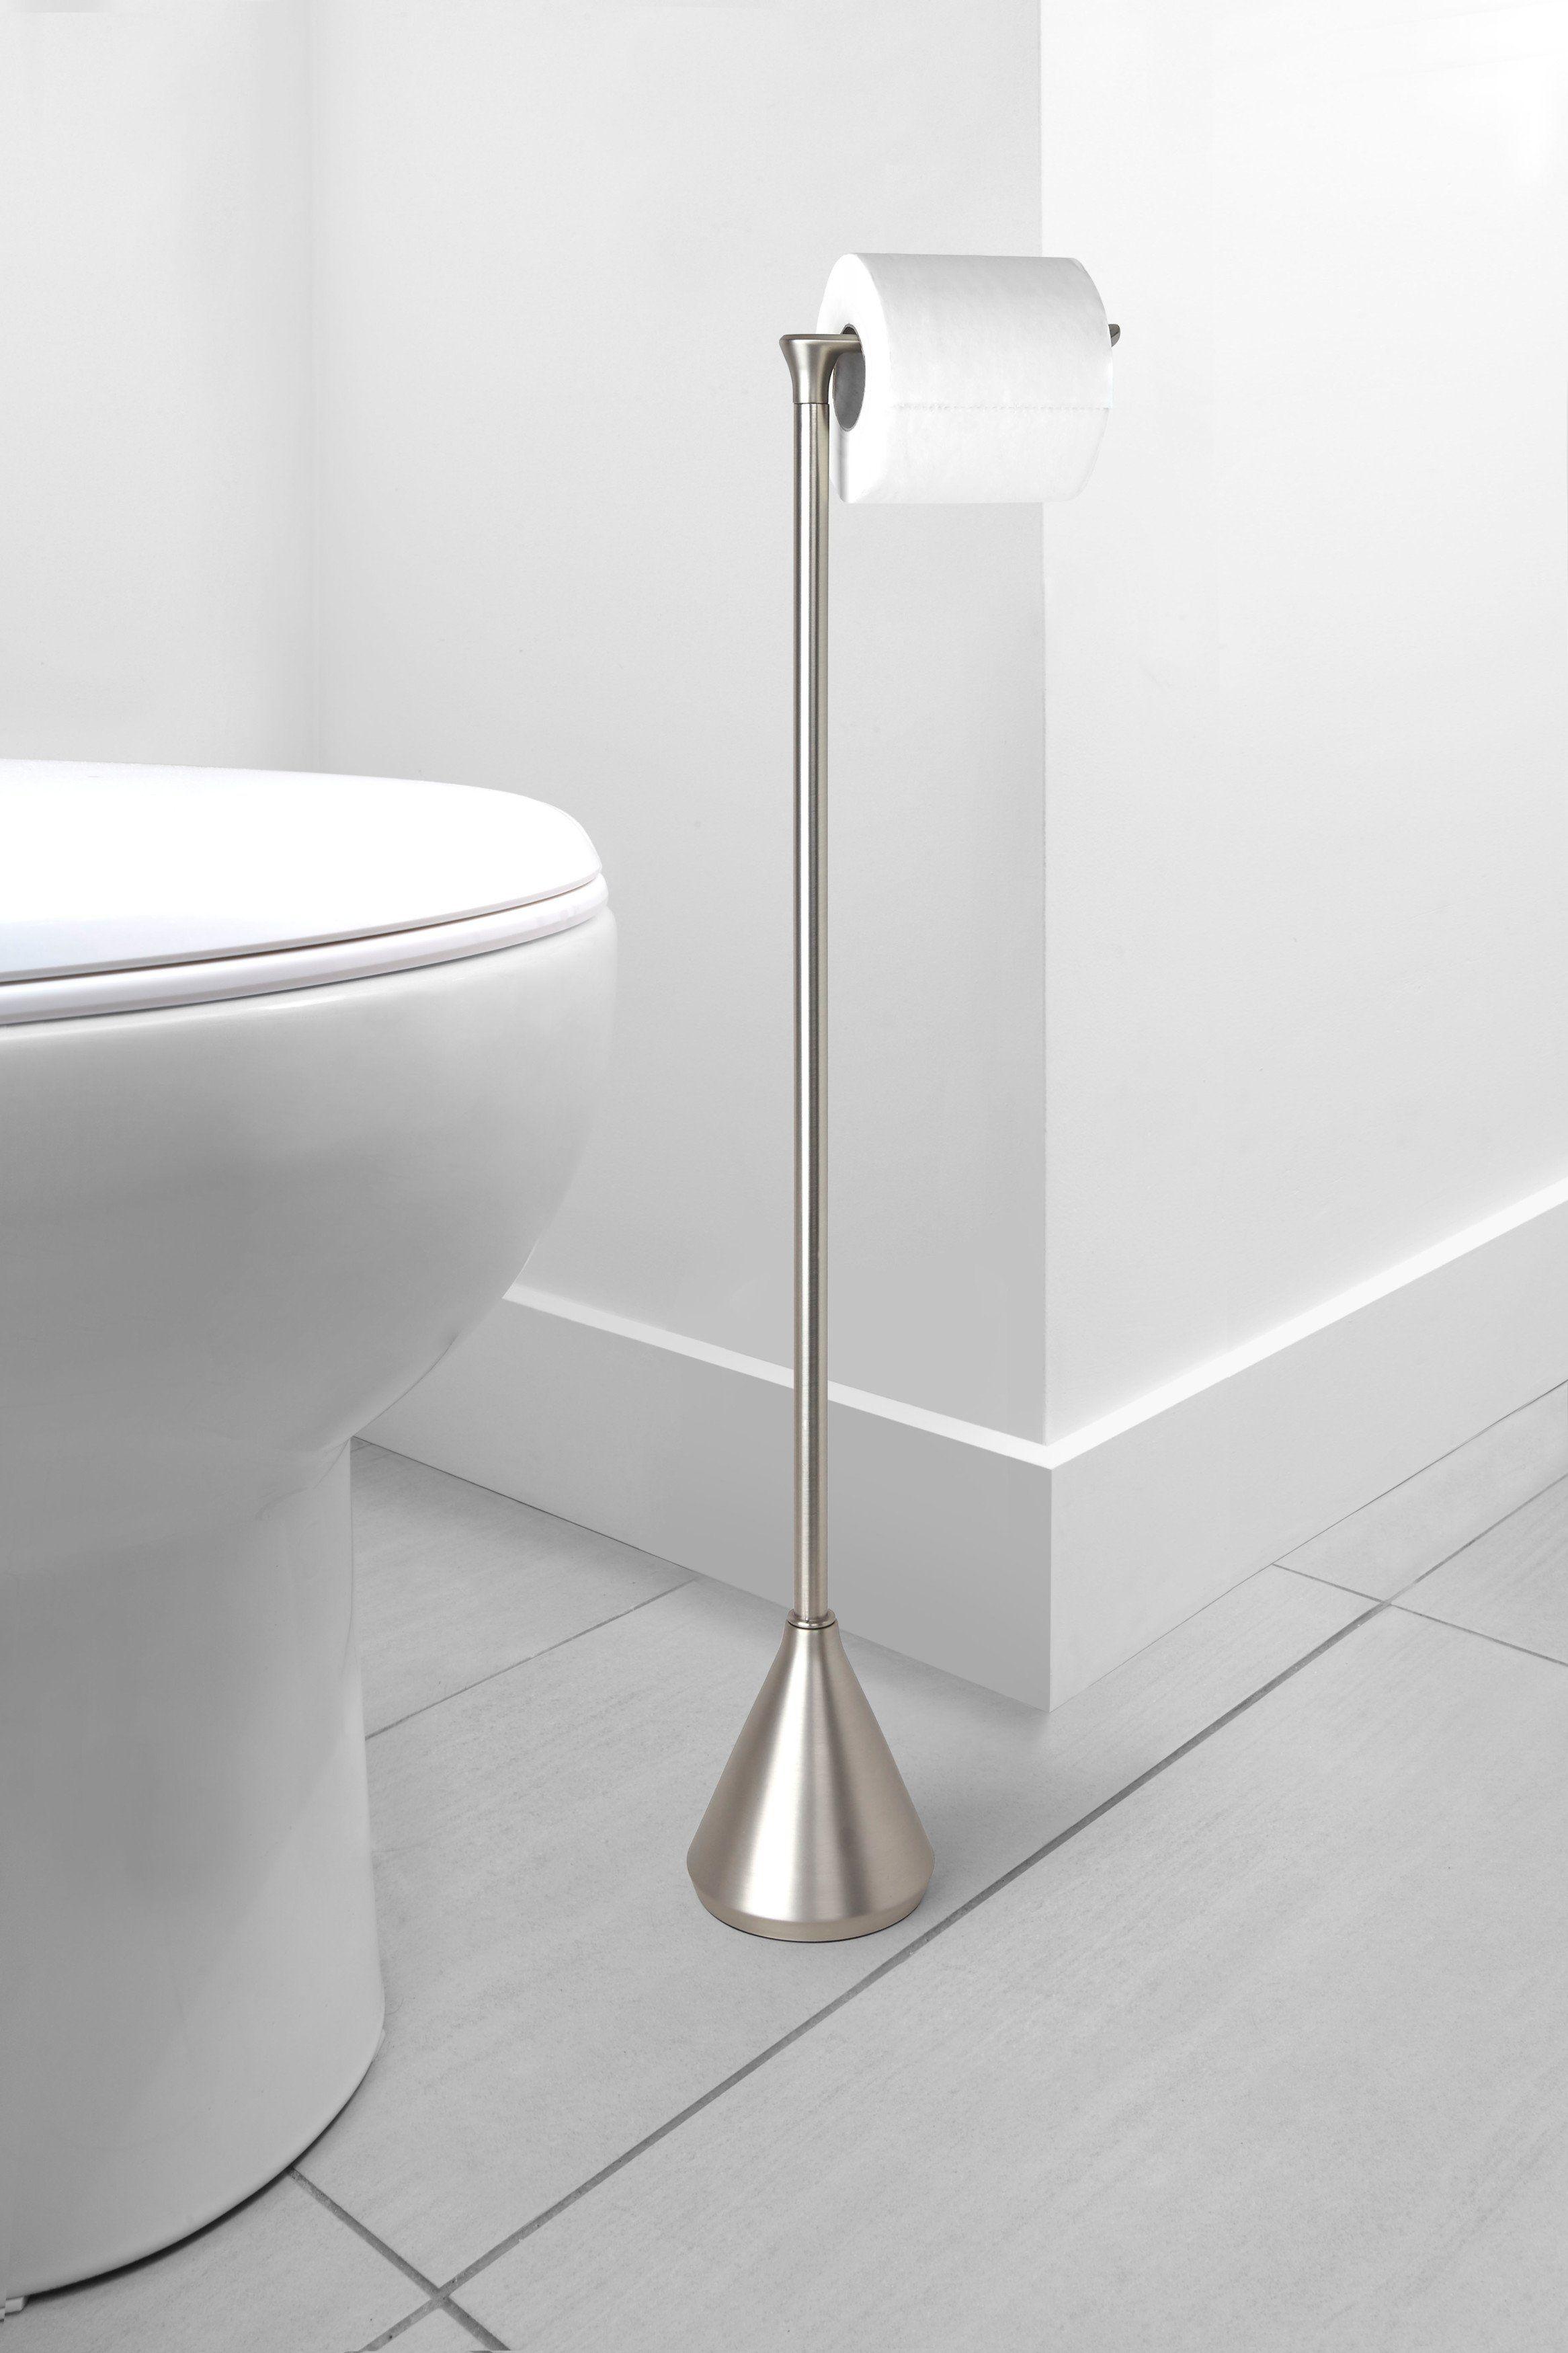 Pinnacle Toilet Paper Stand In 2021 Toilet Paper Stand Toilet Paper Holder Toilet Roll Holder